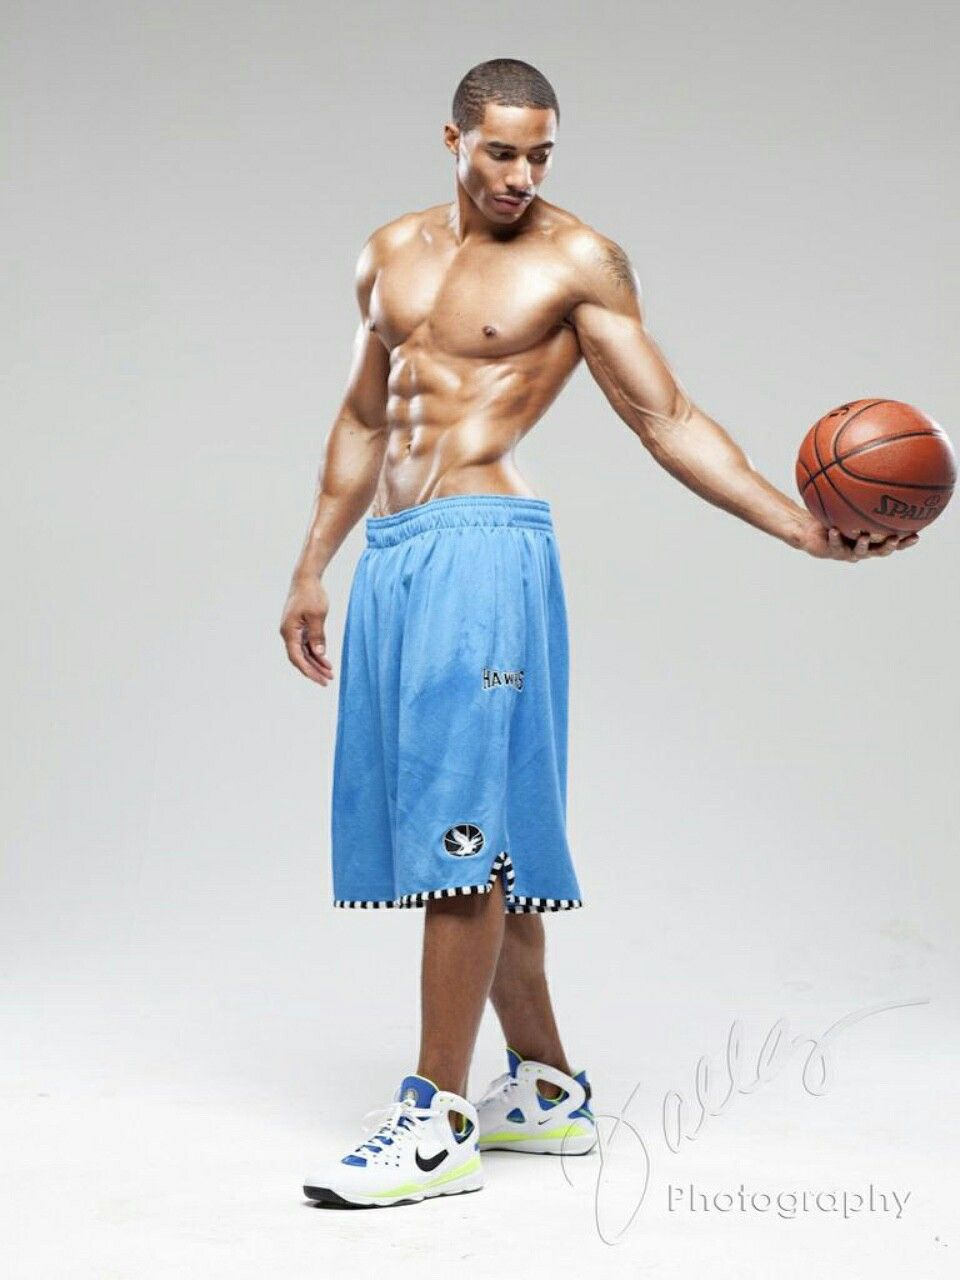 3c00267adee4 Pin anthony williams on love of sports basketball track field jpg 960x1280  Sportswear basketball sports glasses